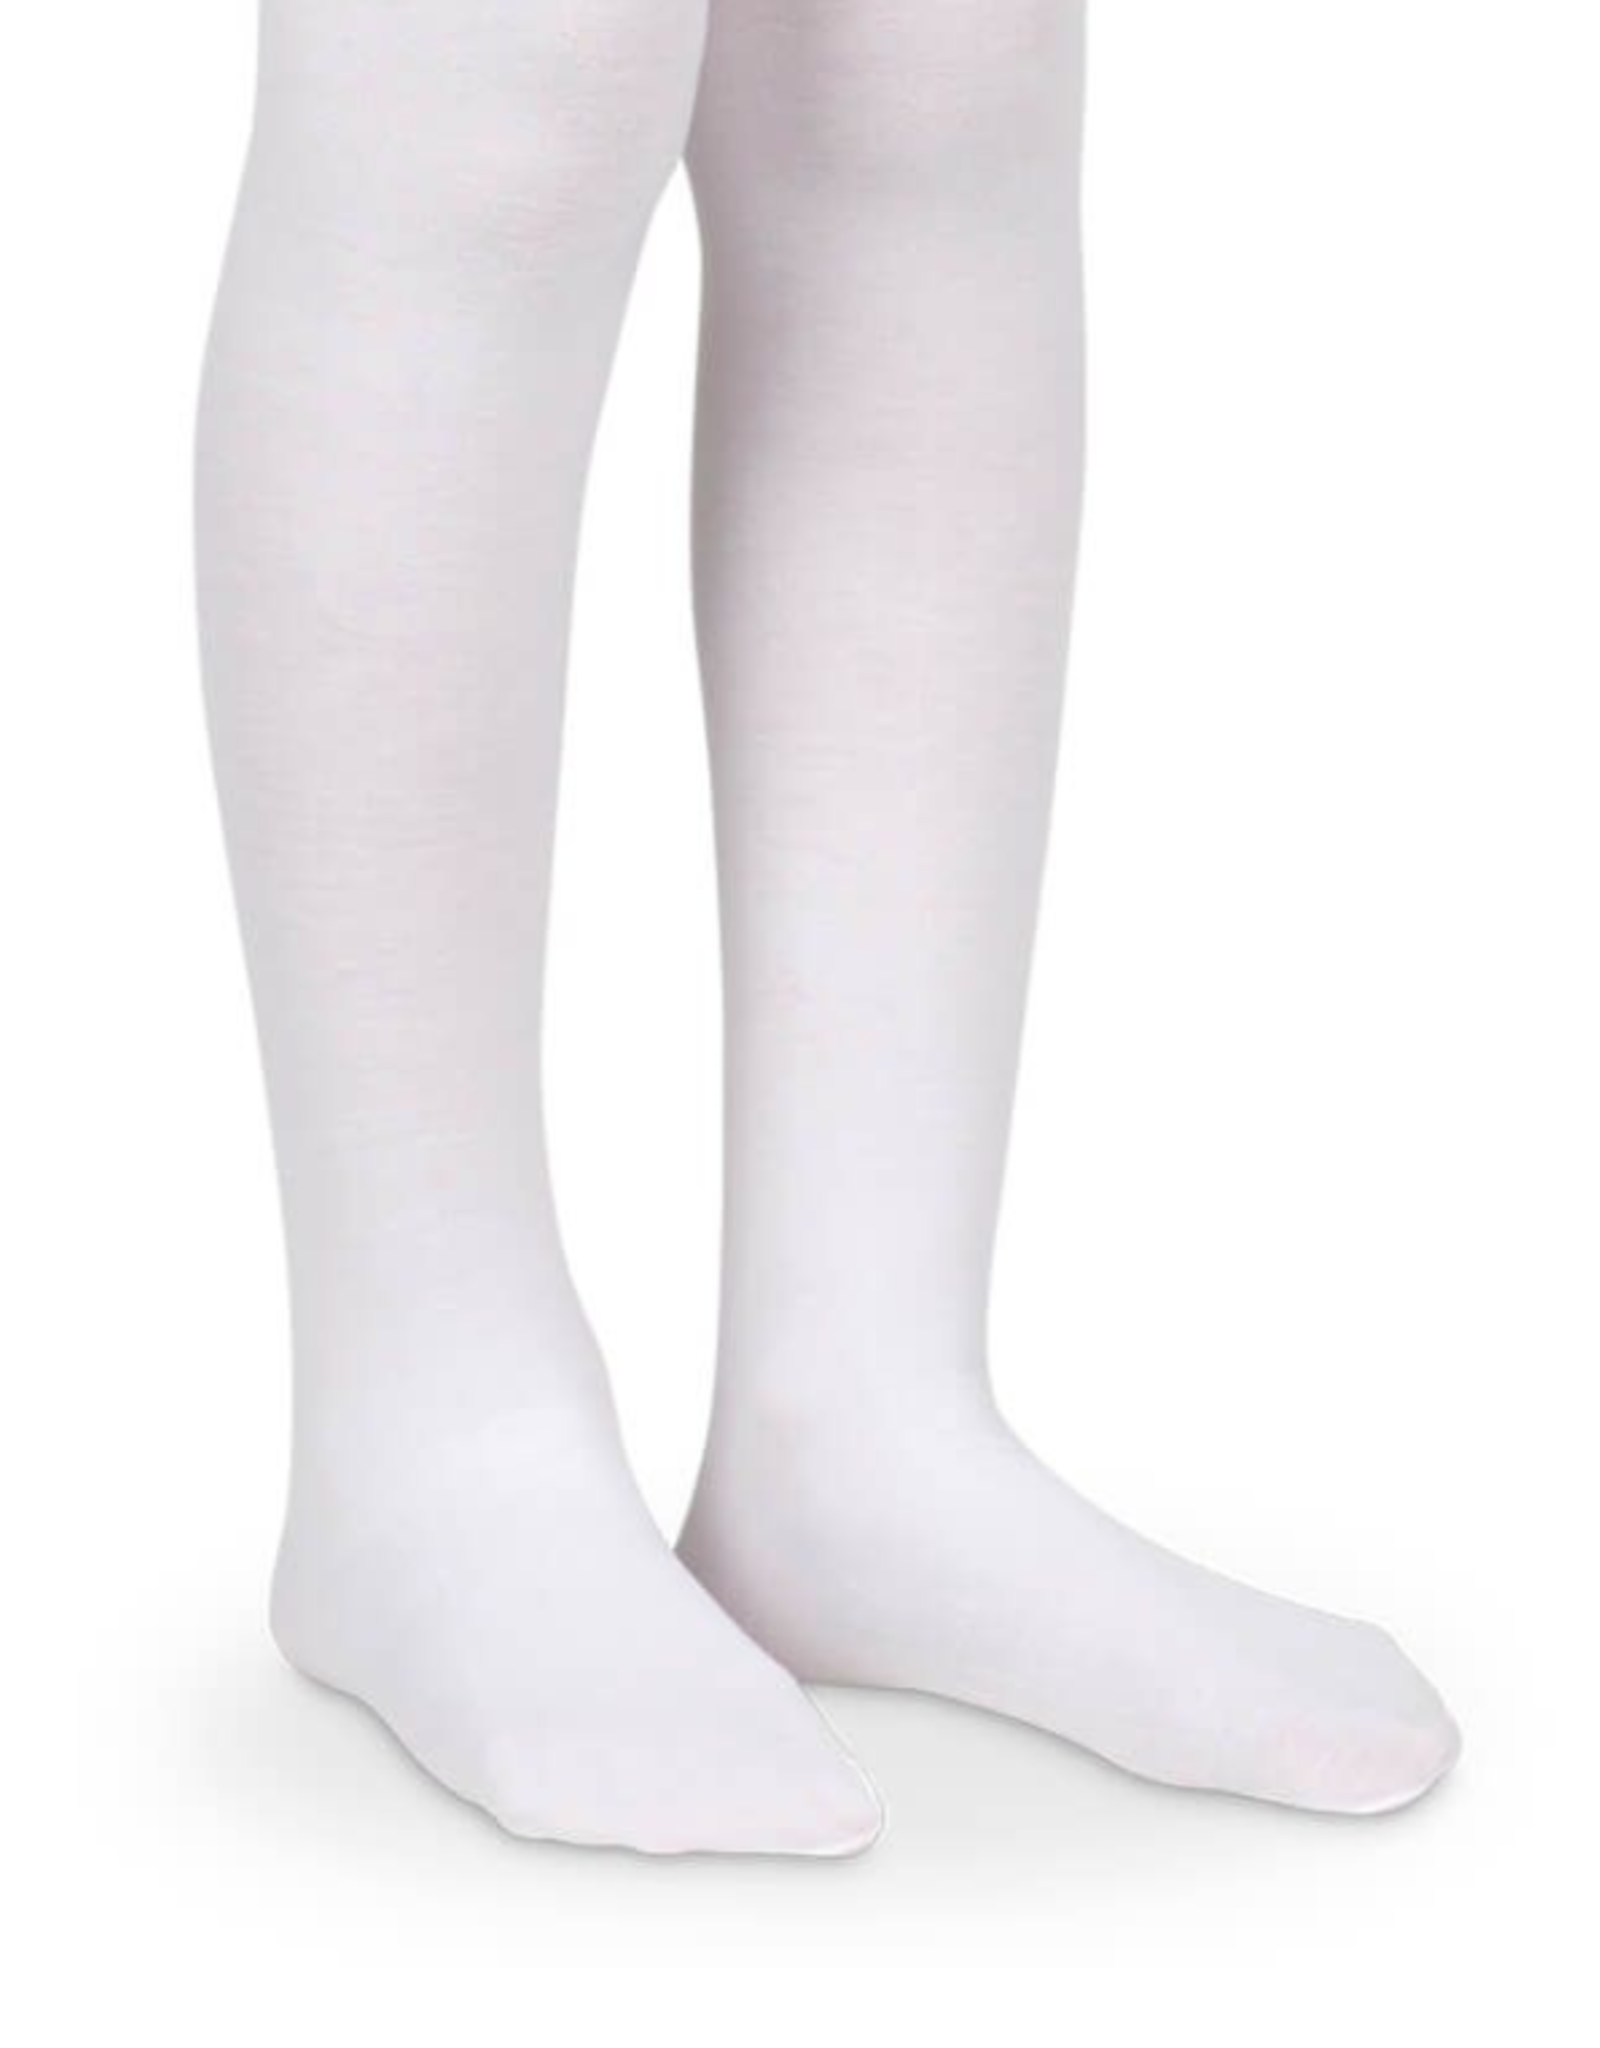 Jefferies Socks White Nylon Tights 1445